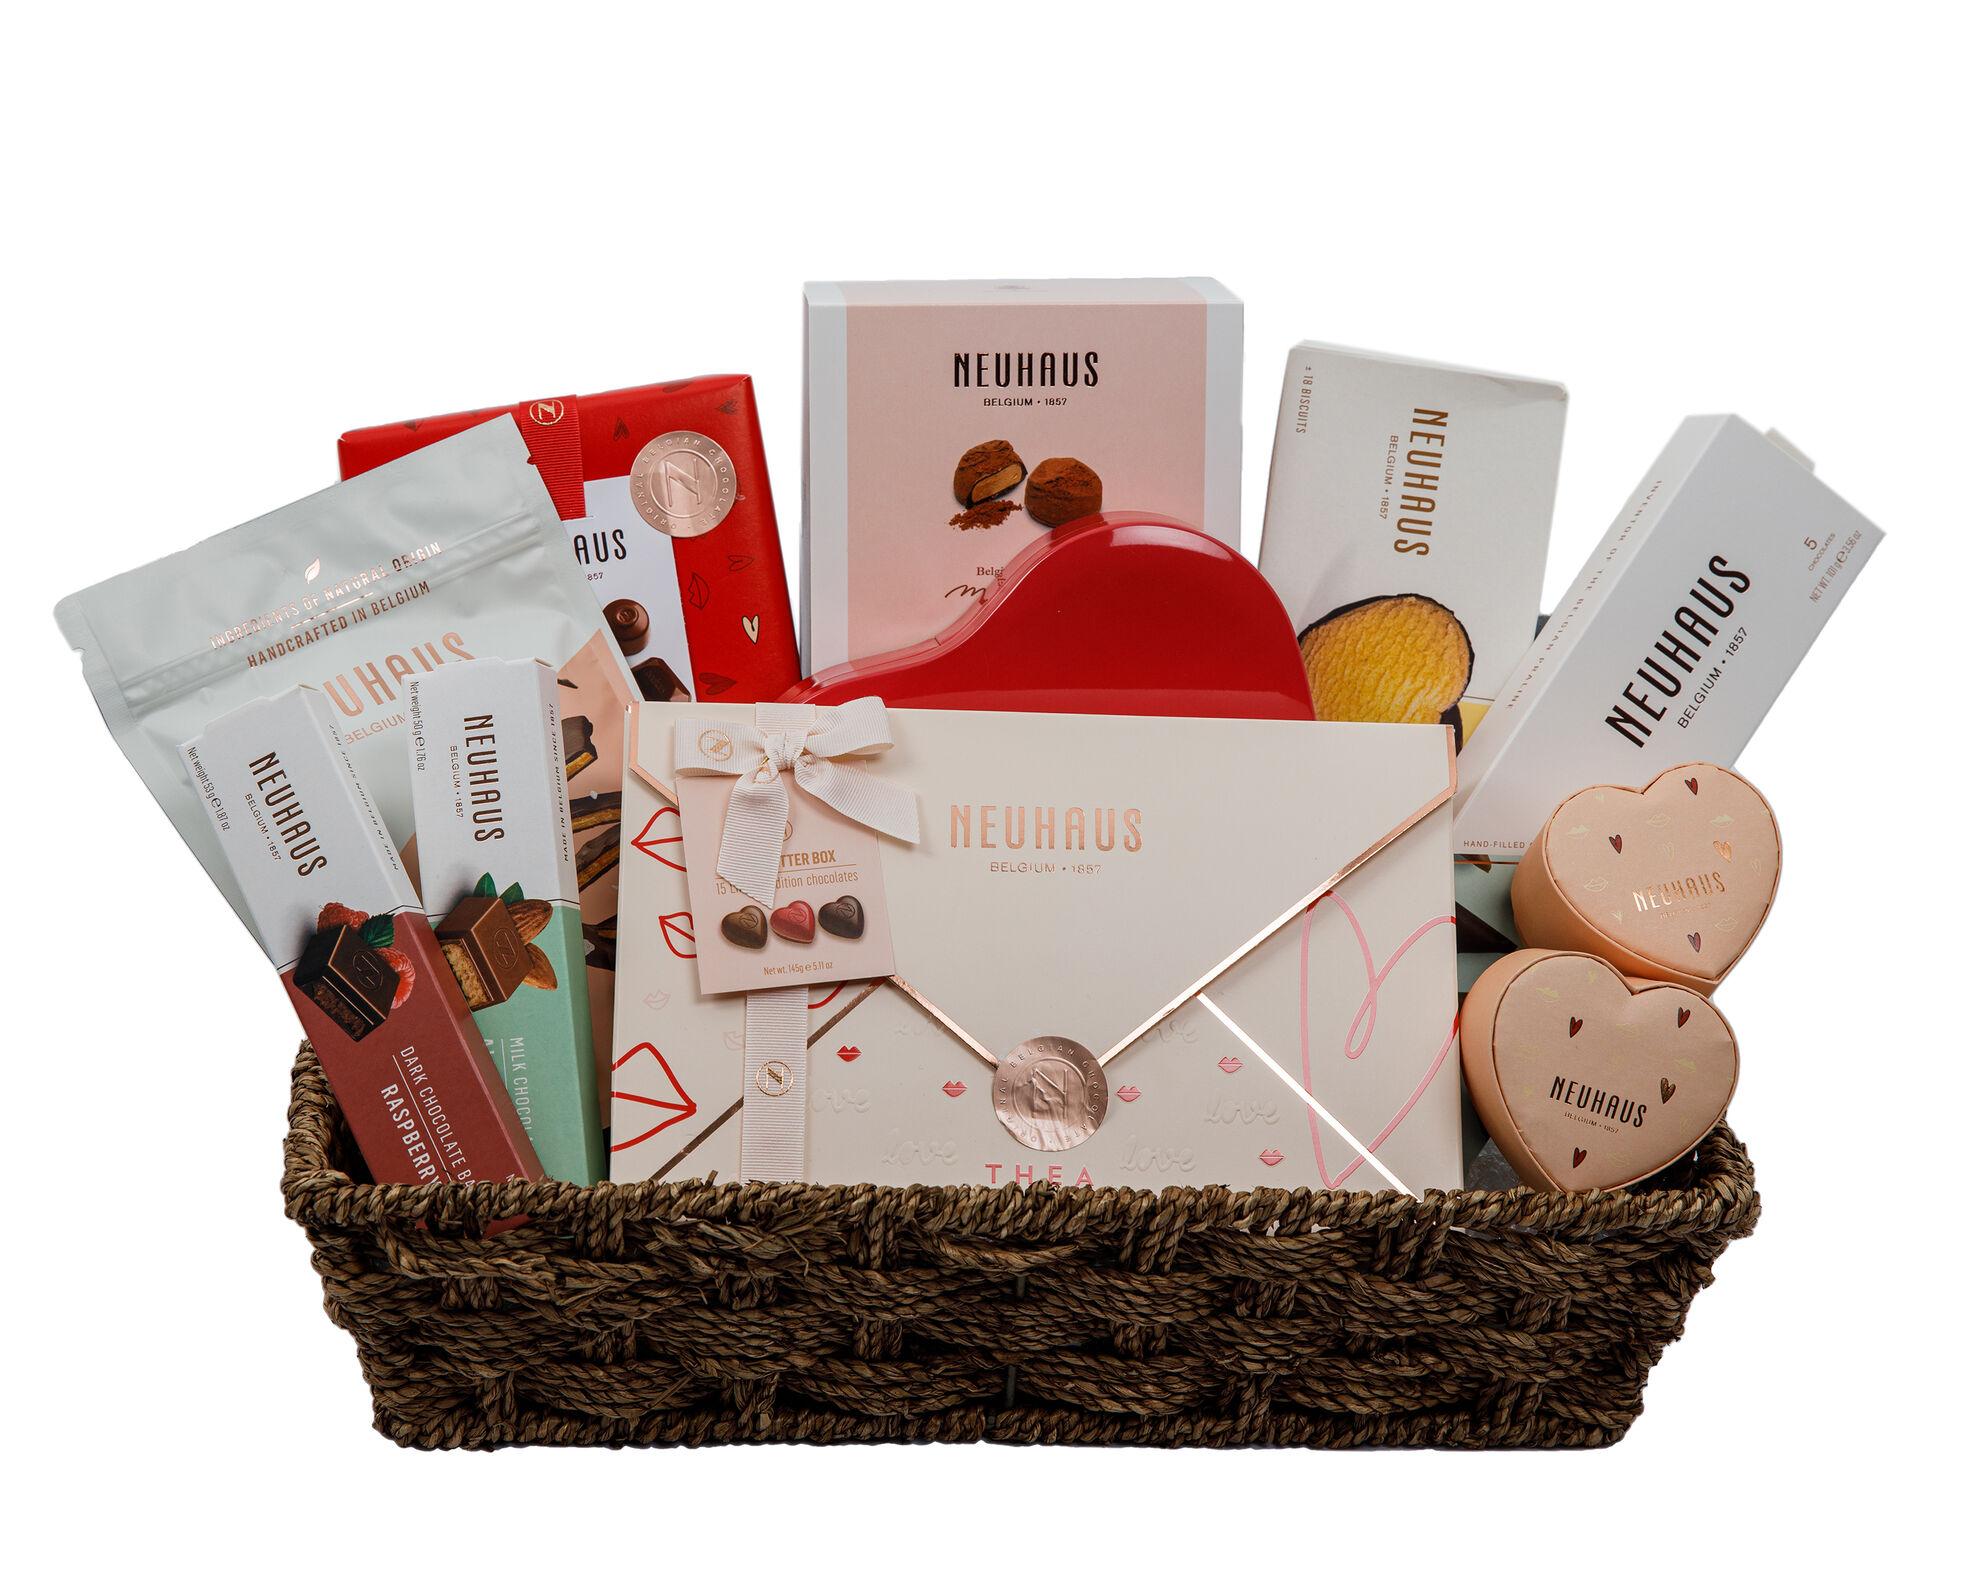 Neuhaus Ultimate Romantic Valentine Gift Basket image number 01